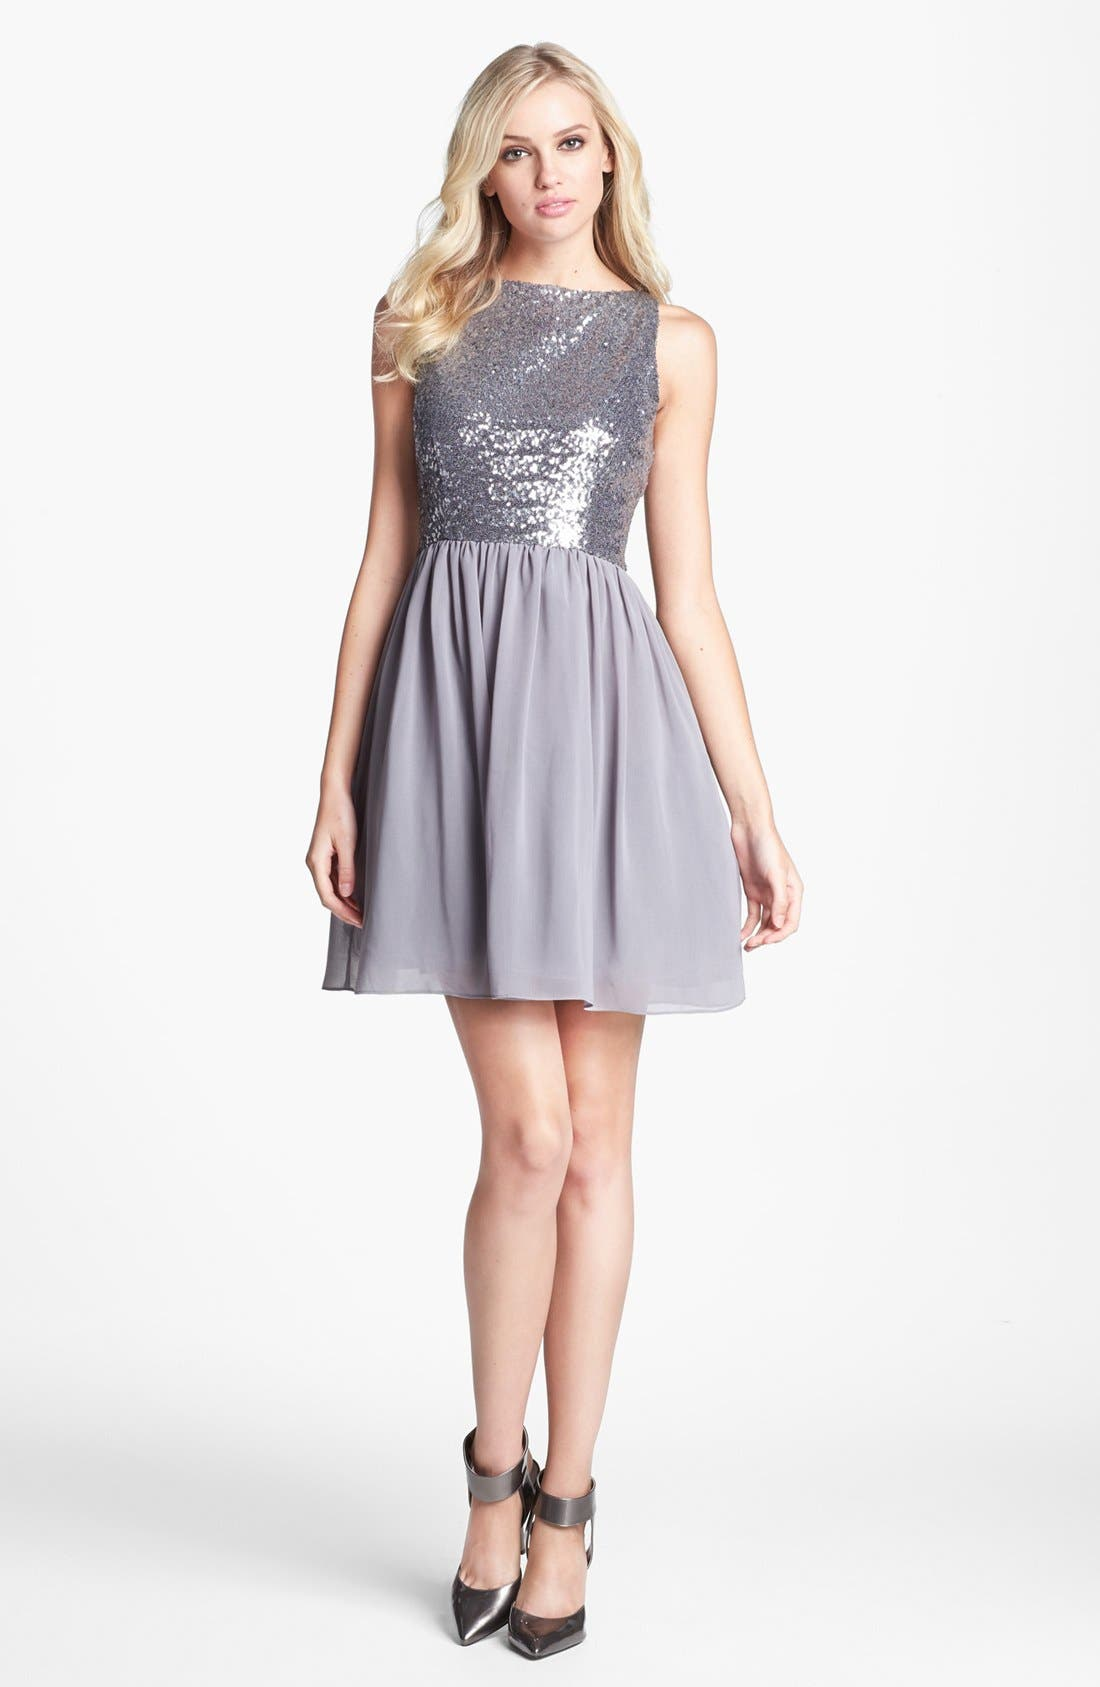 Main Image - BB Dakota Embellished Fit & Flare Dress